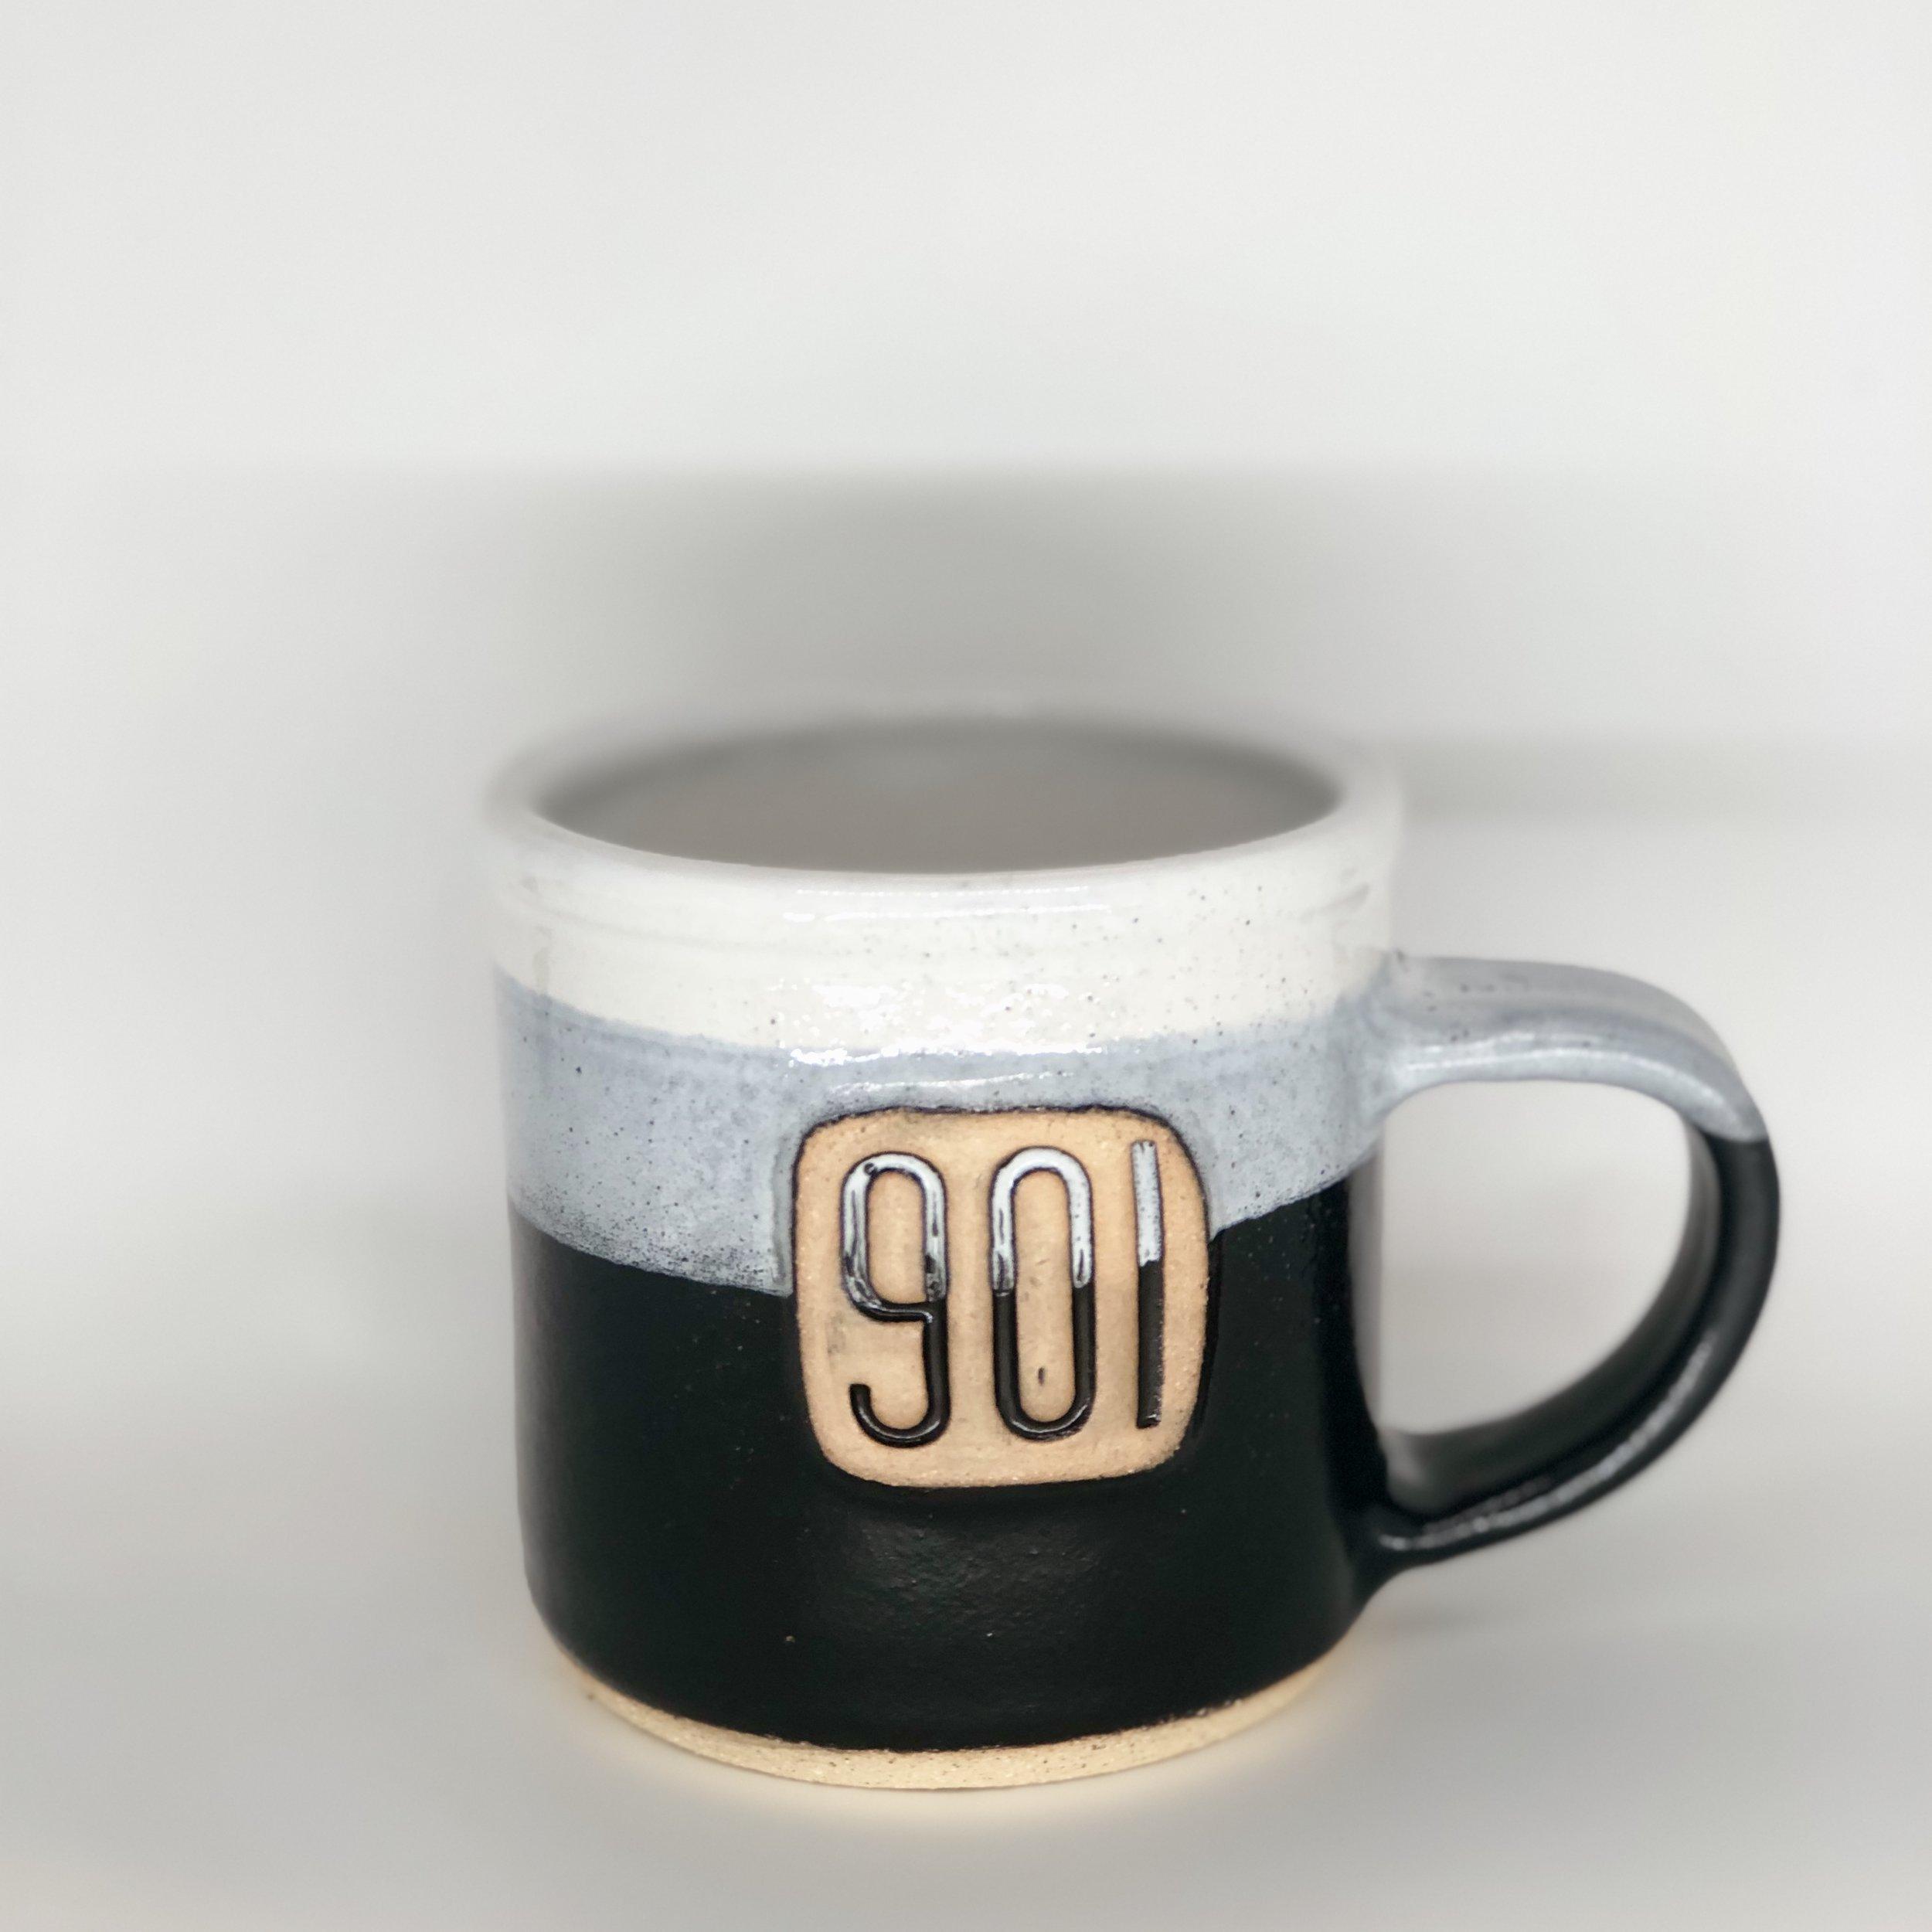 901 Mug, Short Mug, White / Black Color